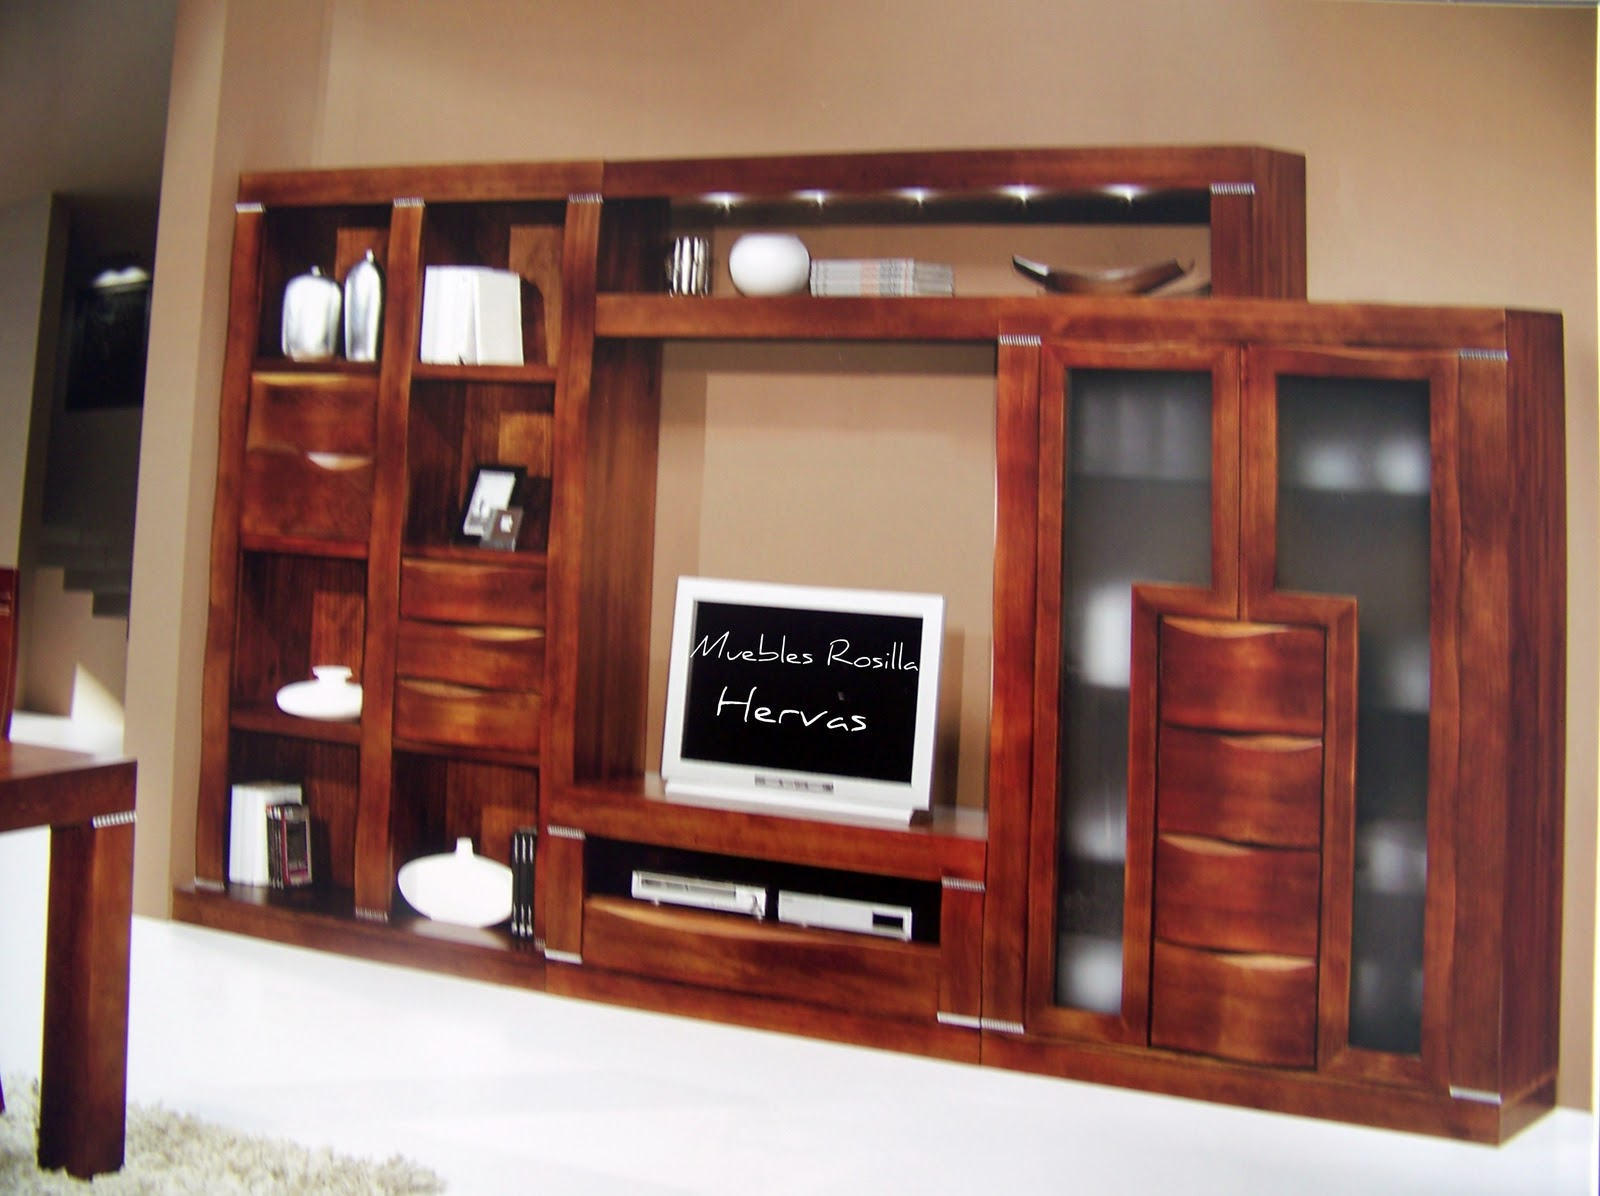 Muebles rosilla herv s composici n con luces led for Muebles hervas